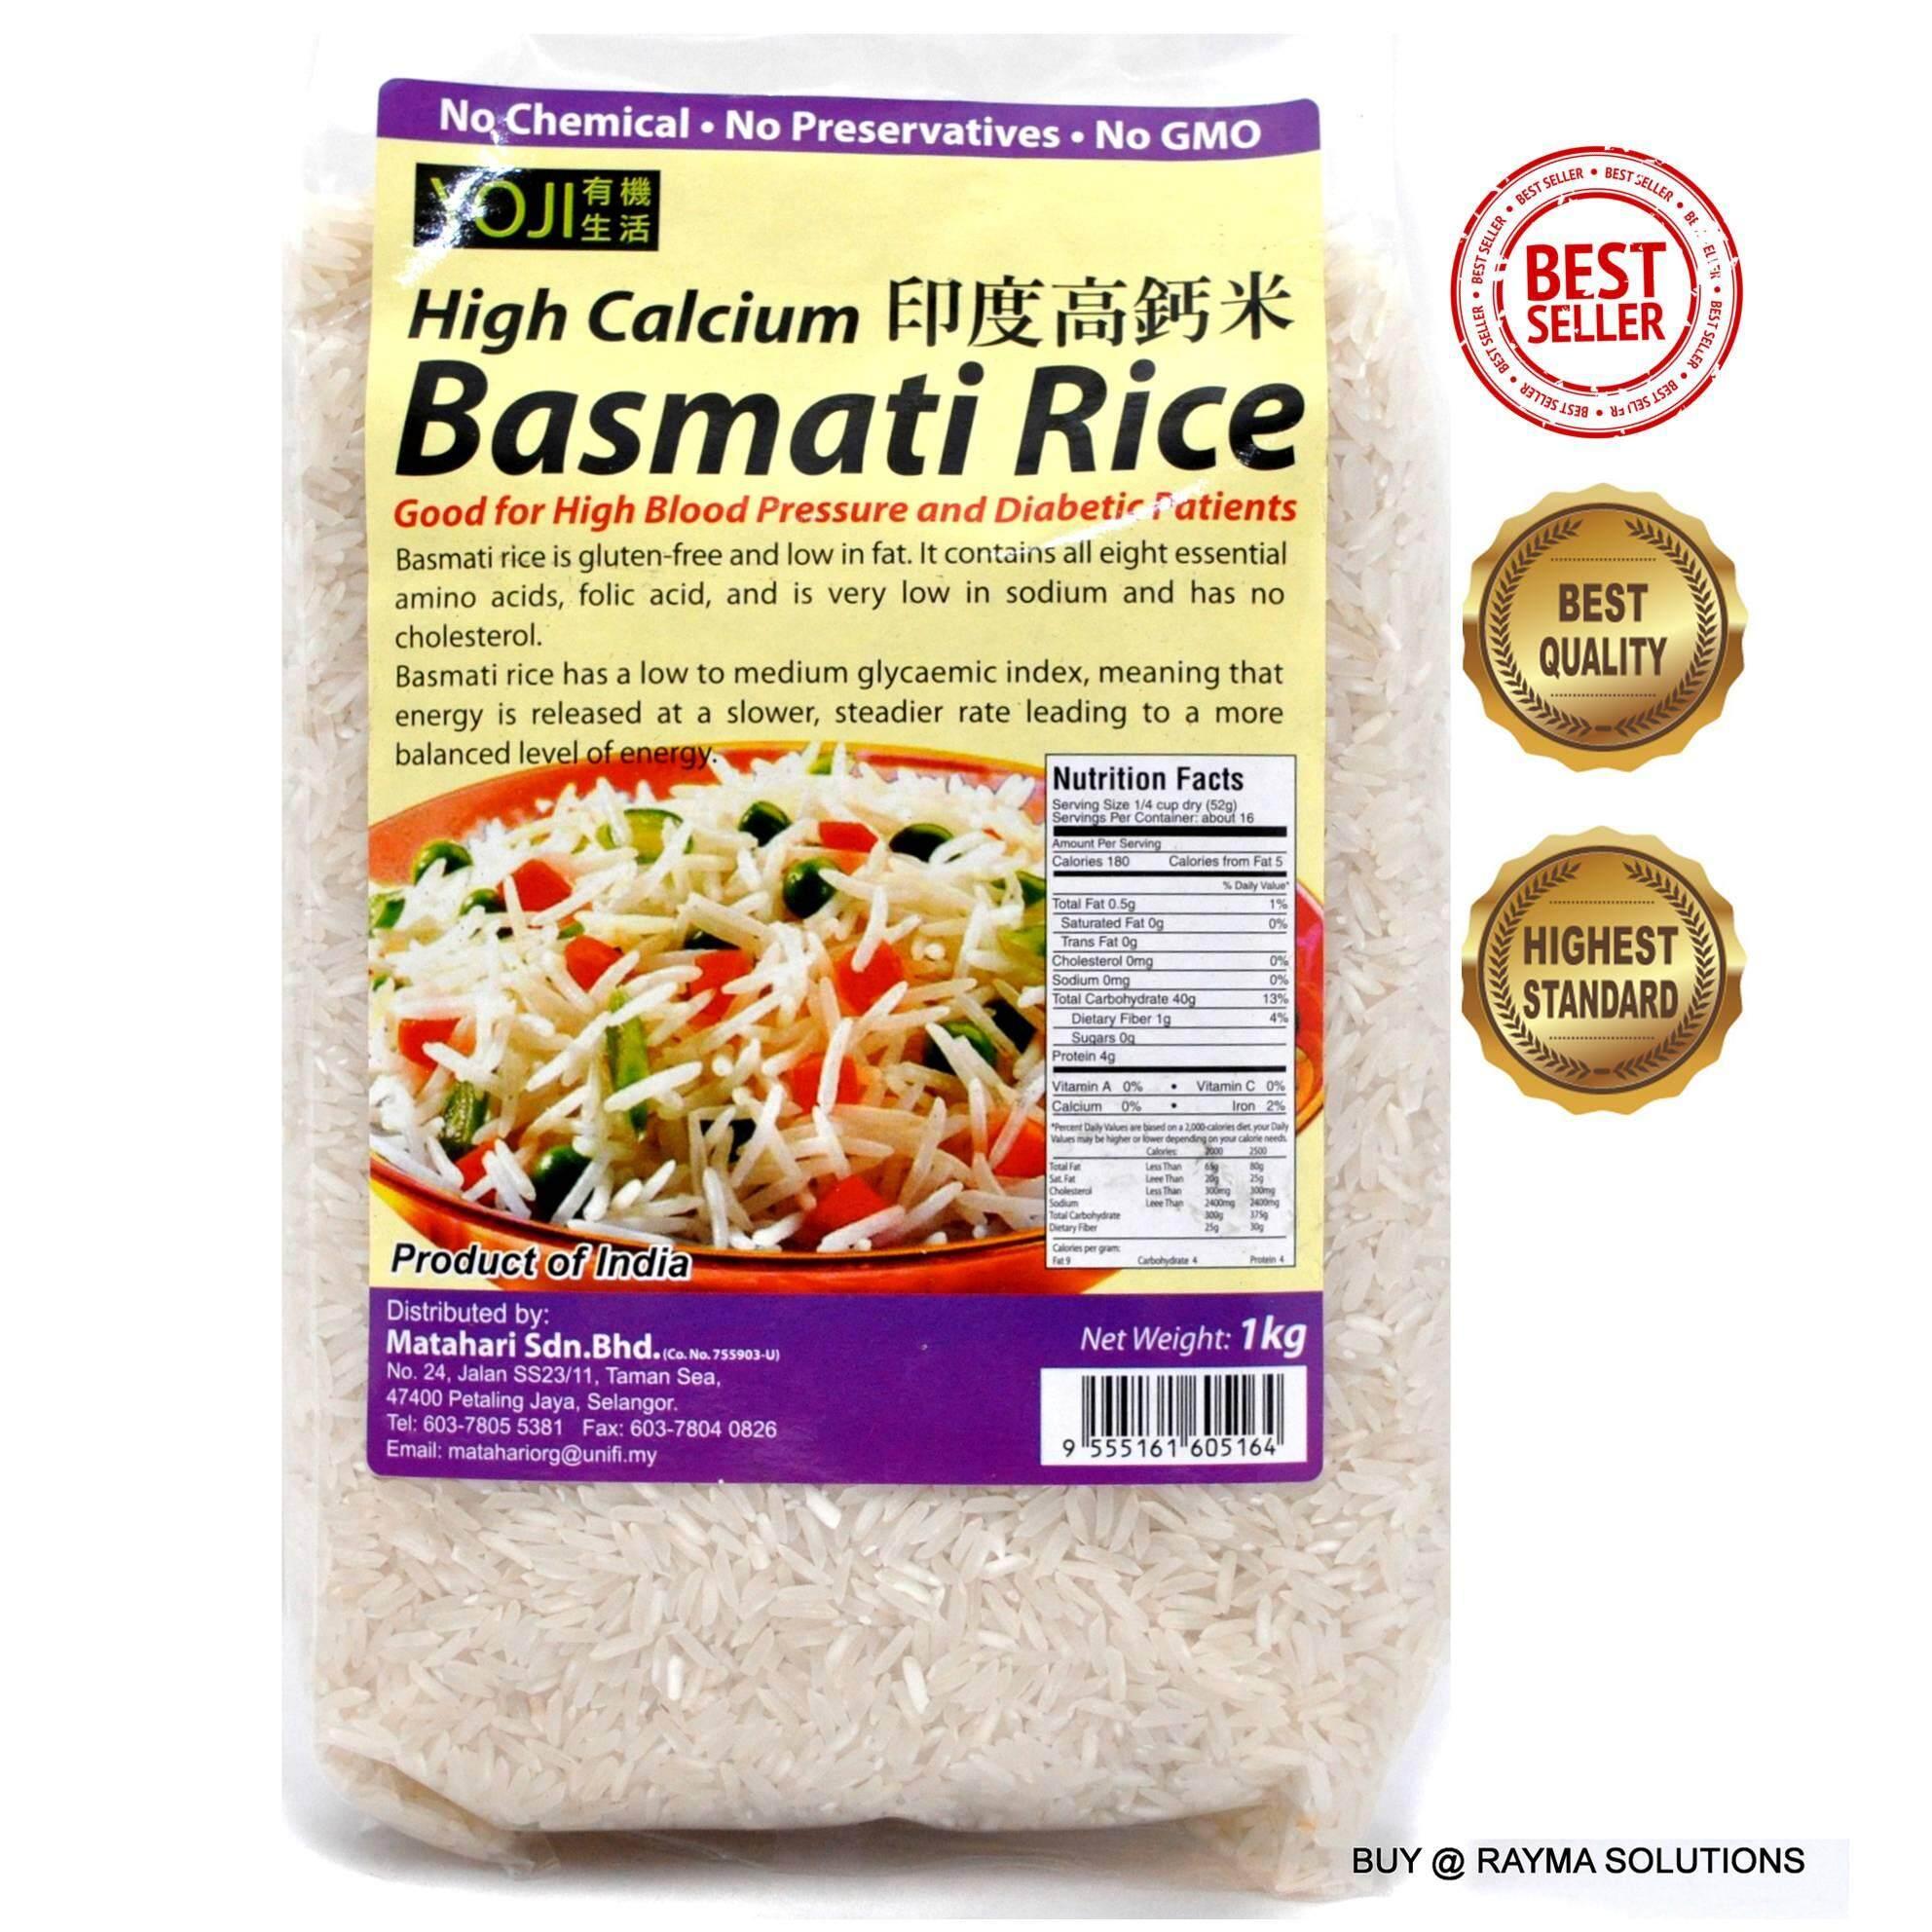 MH FOOD High Calcium Basmati Rice, Gluten Free, 1kg